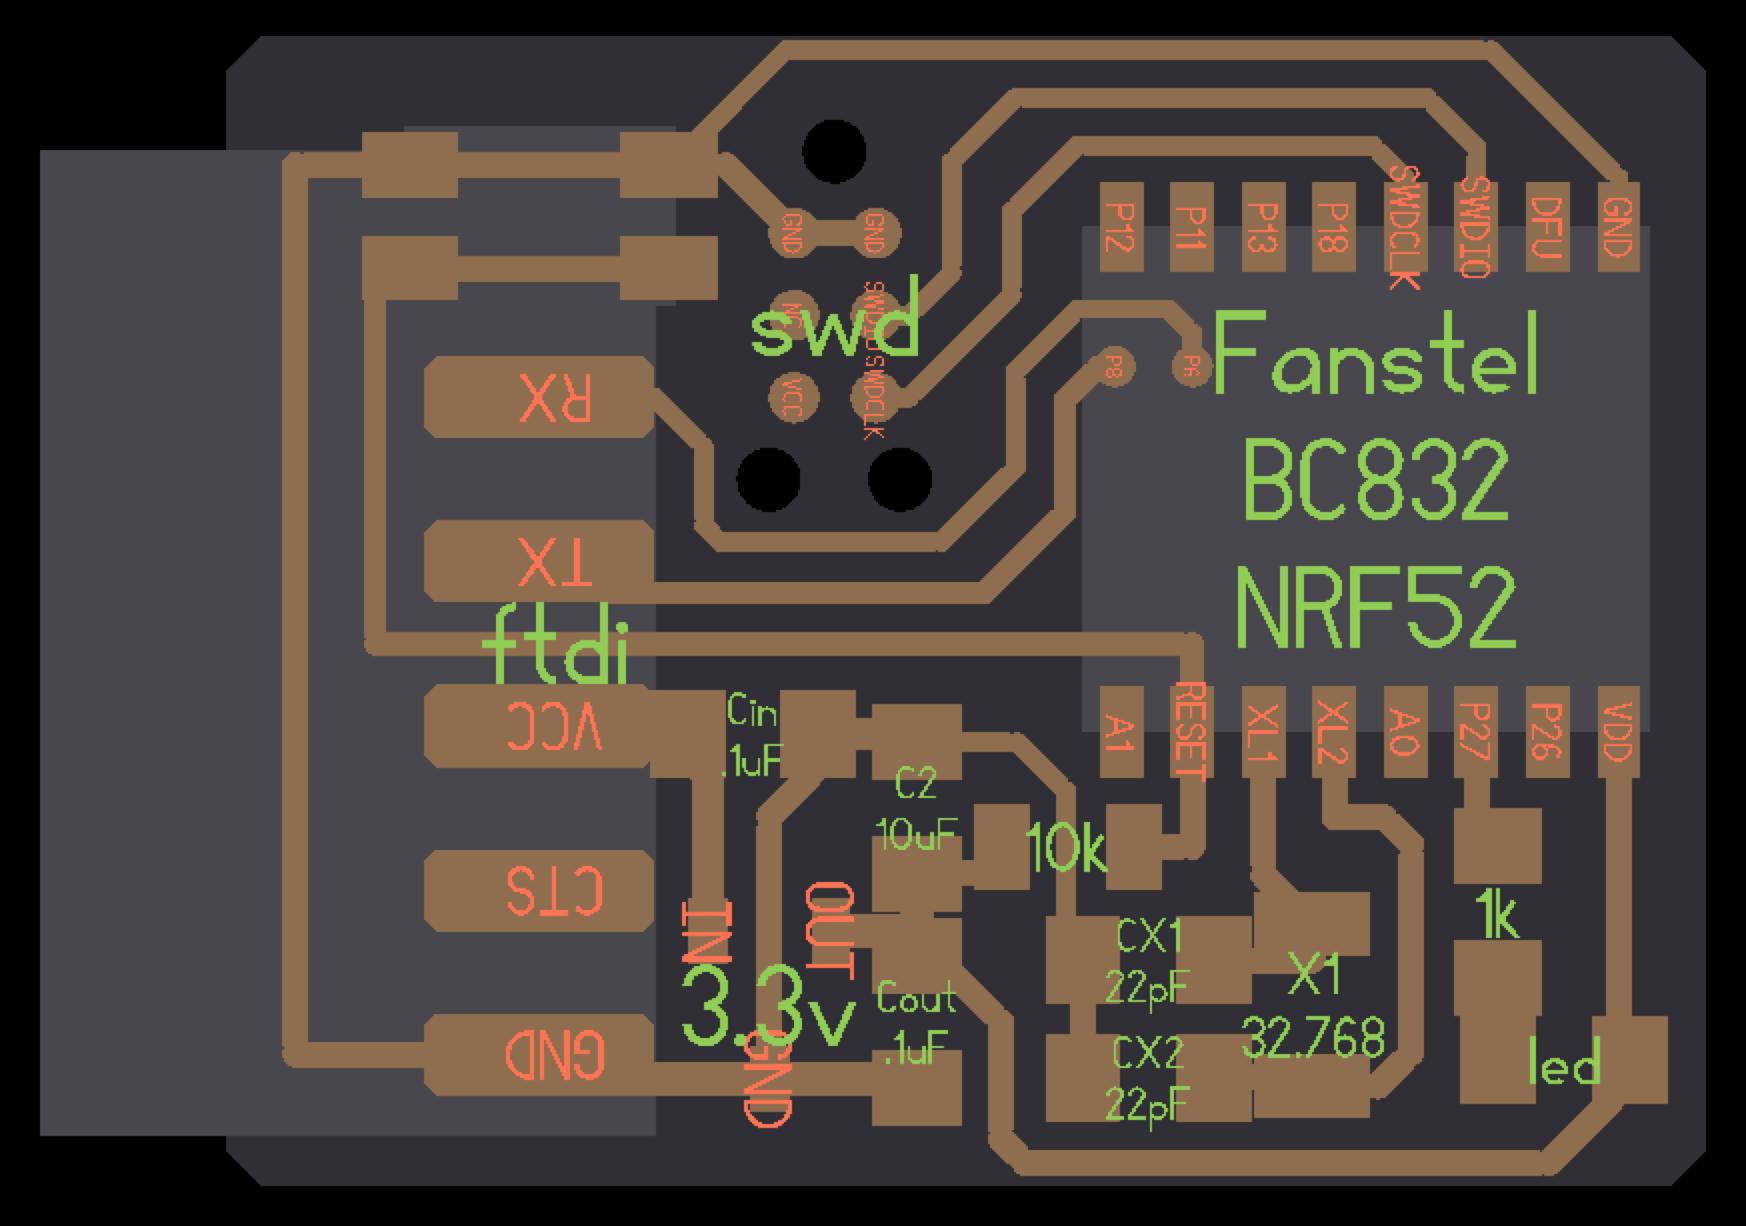 rf/nrf52832/bc832-nrf-ftdi-layout.png